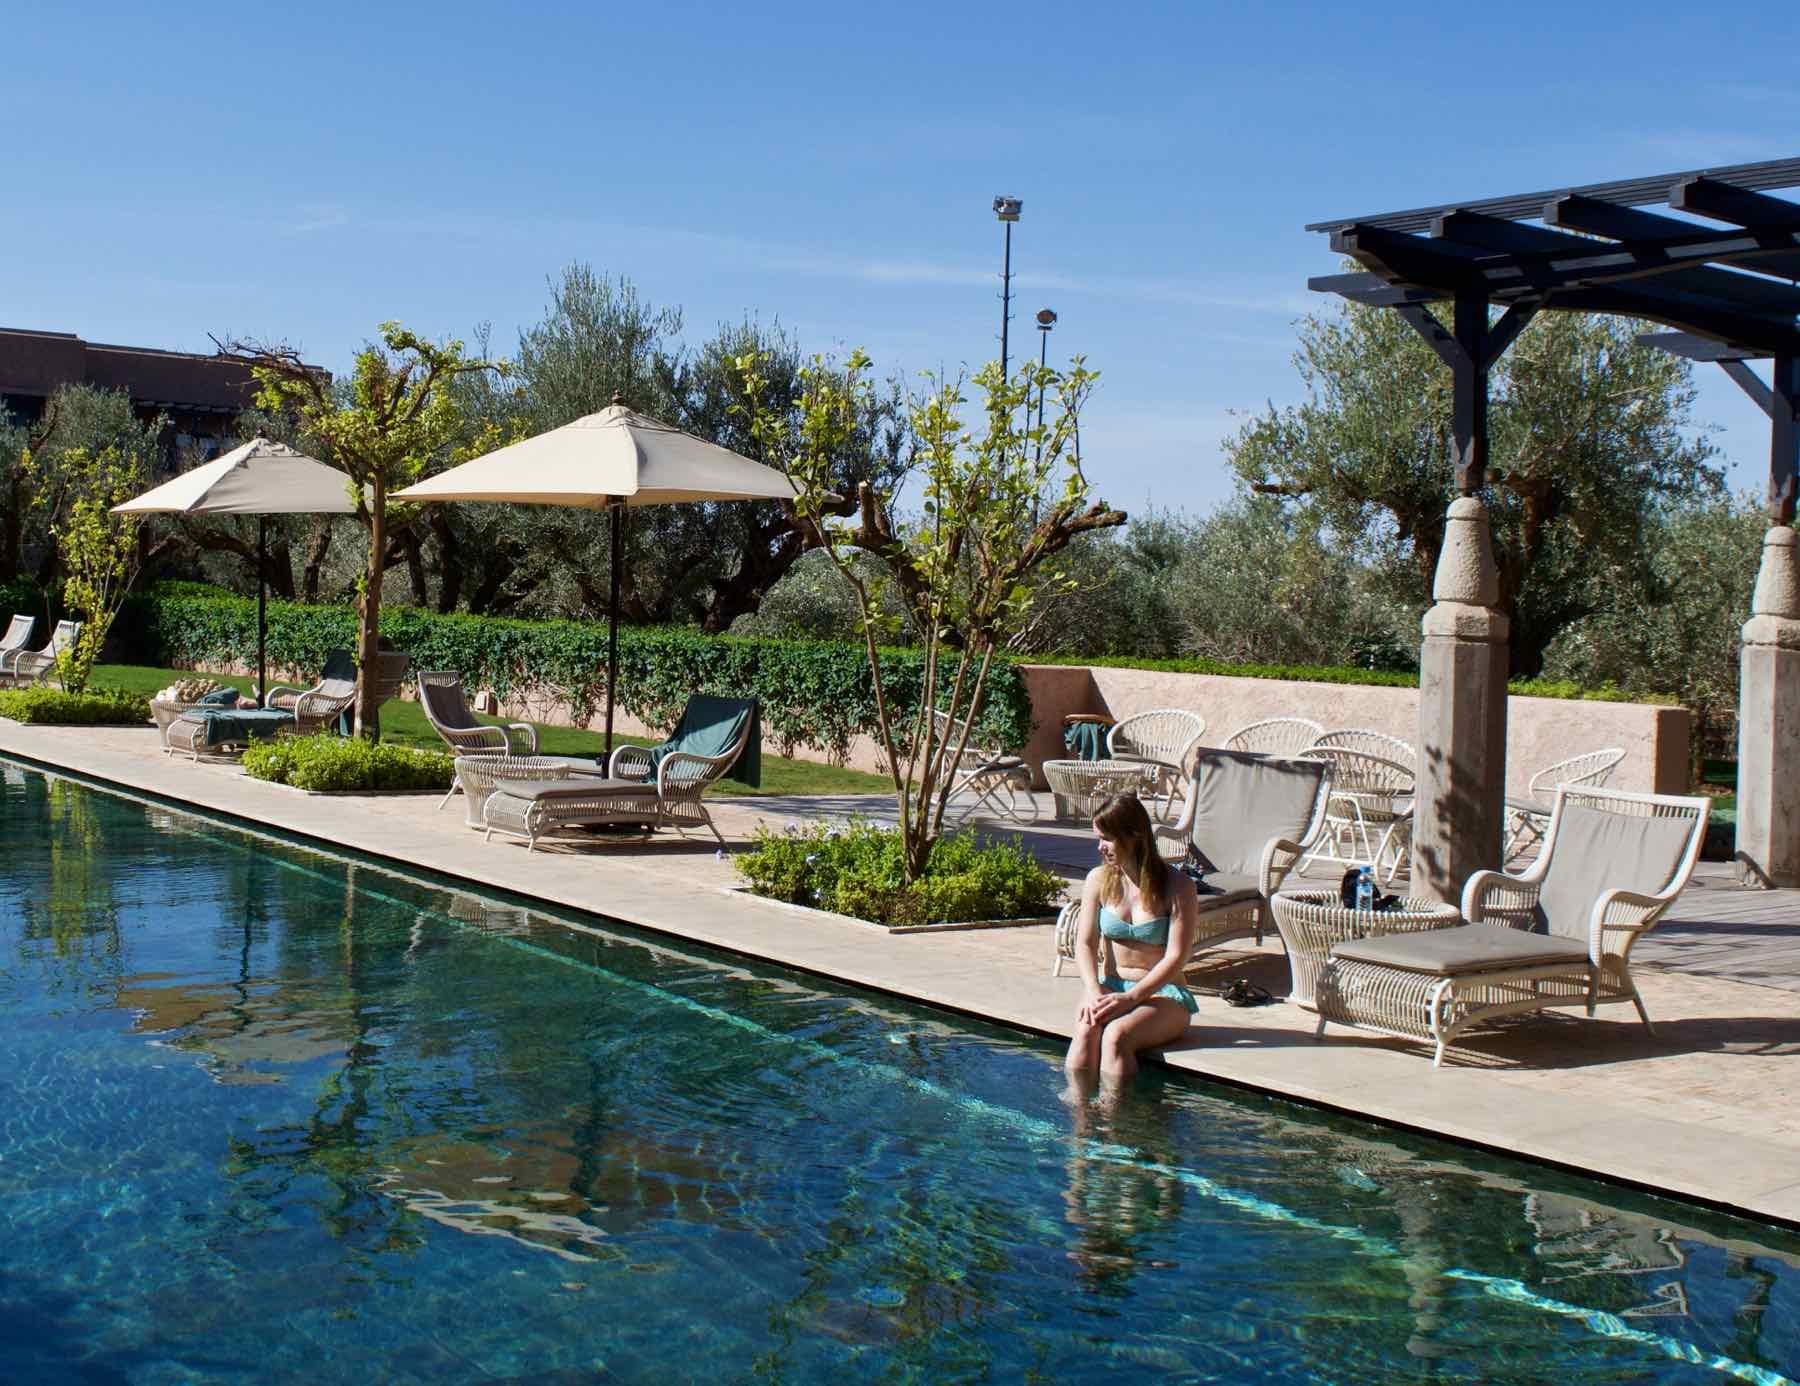 Enjoying the pool at Royal Palm Hotel Marrakech